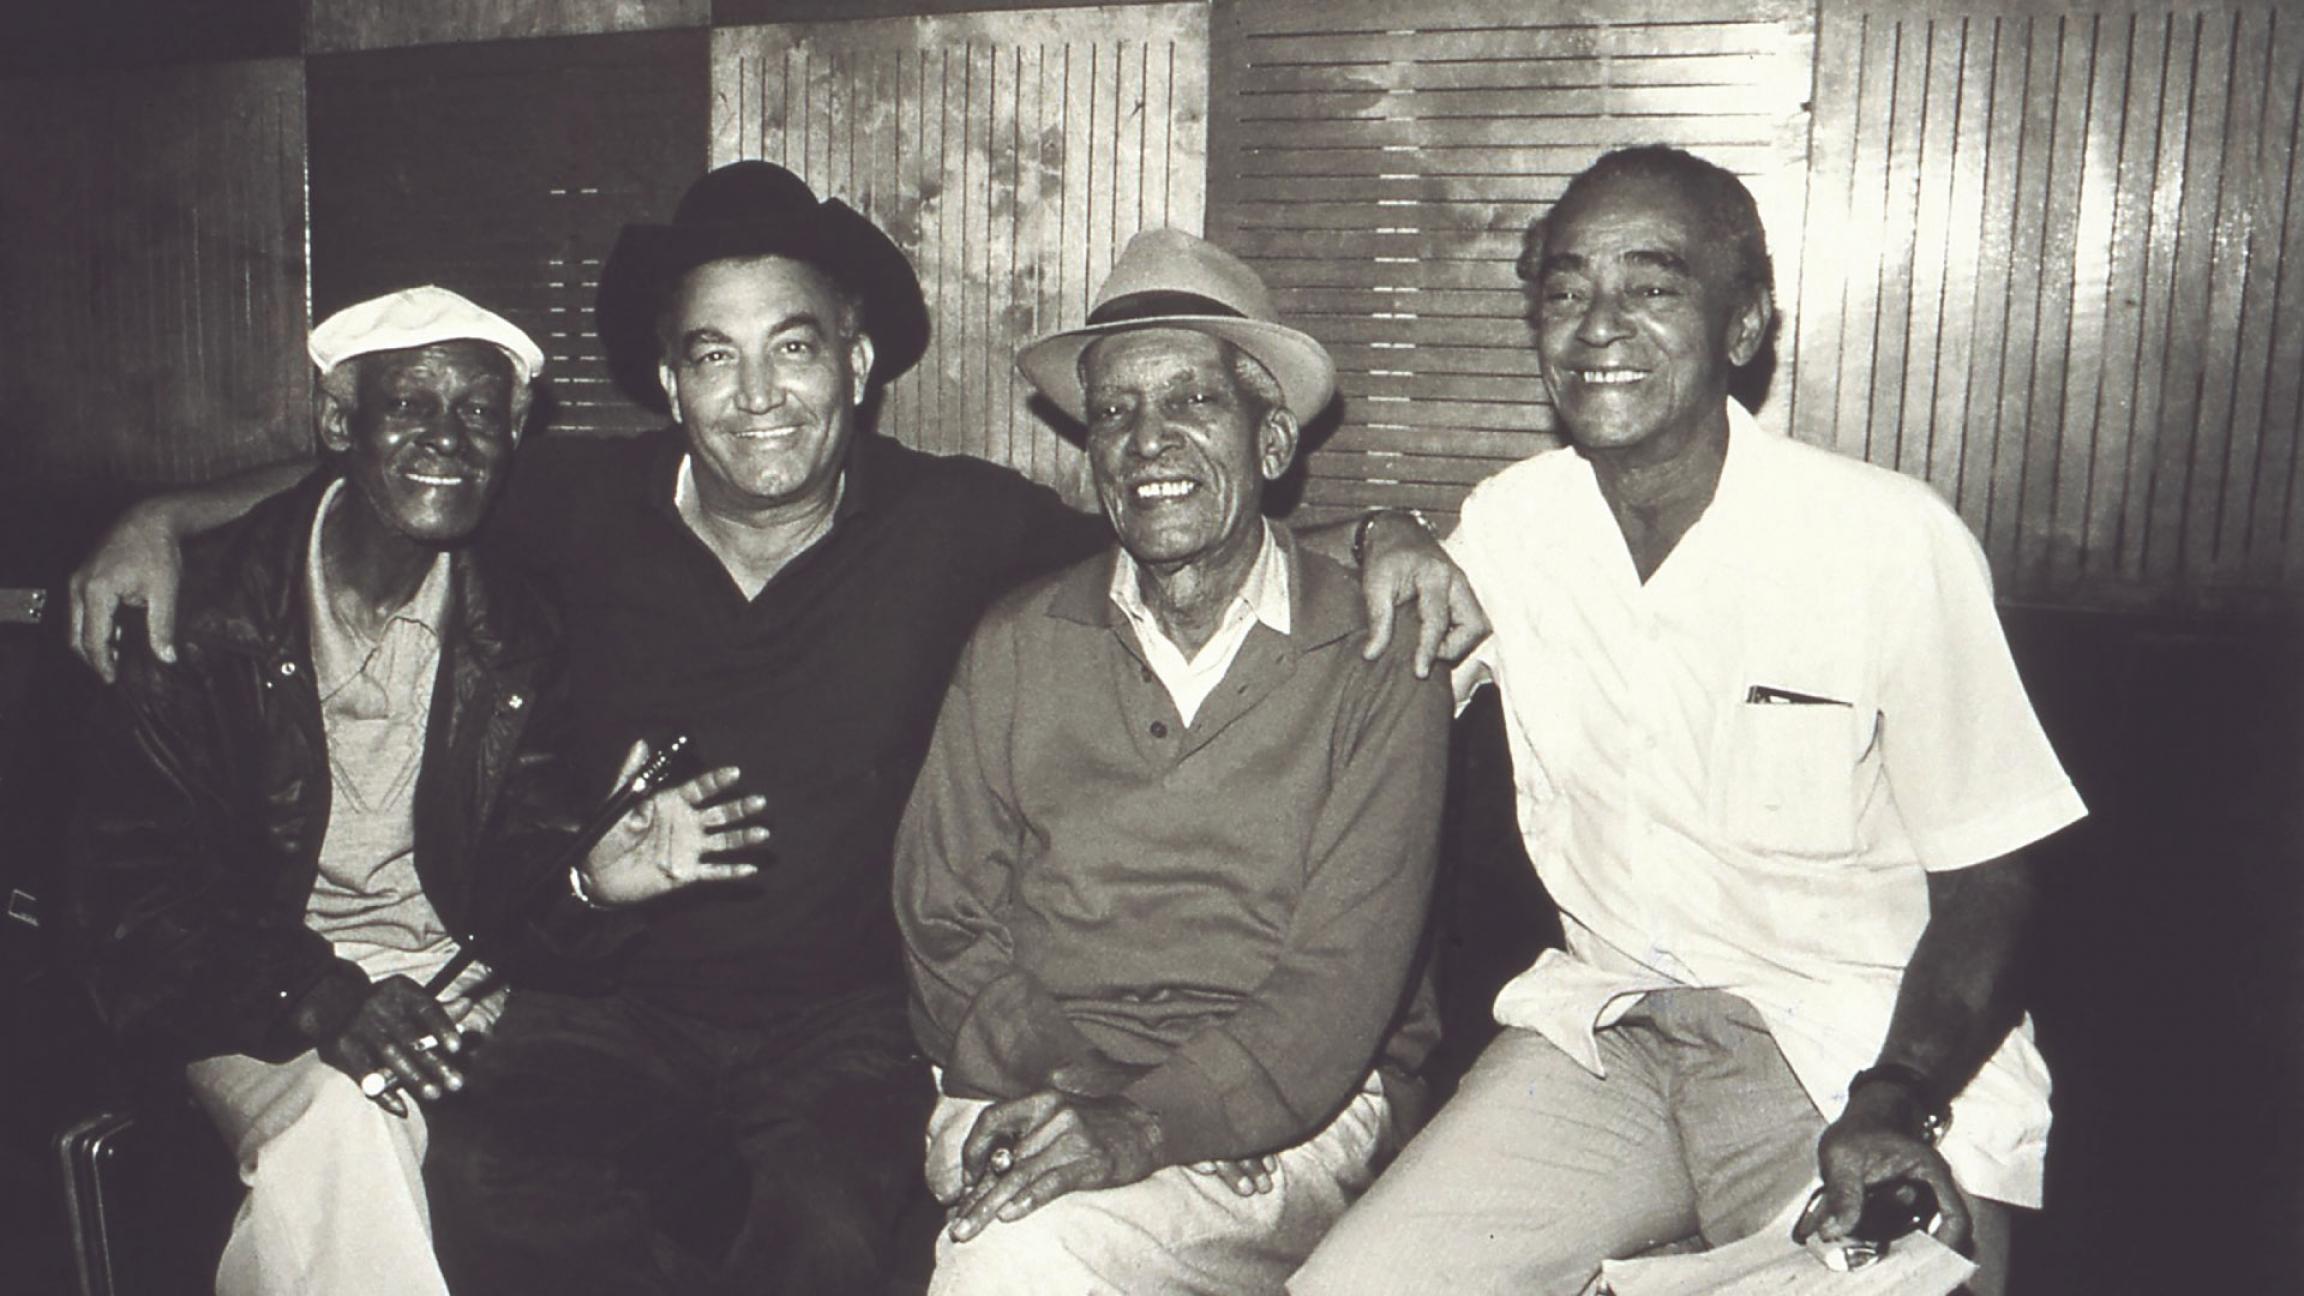 A black and white photo of Buena Vista Social Club members Ibrahim Ferrer, Eliades Ochoa, Comapy Segundo and Puntillita Licea.